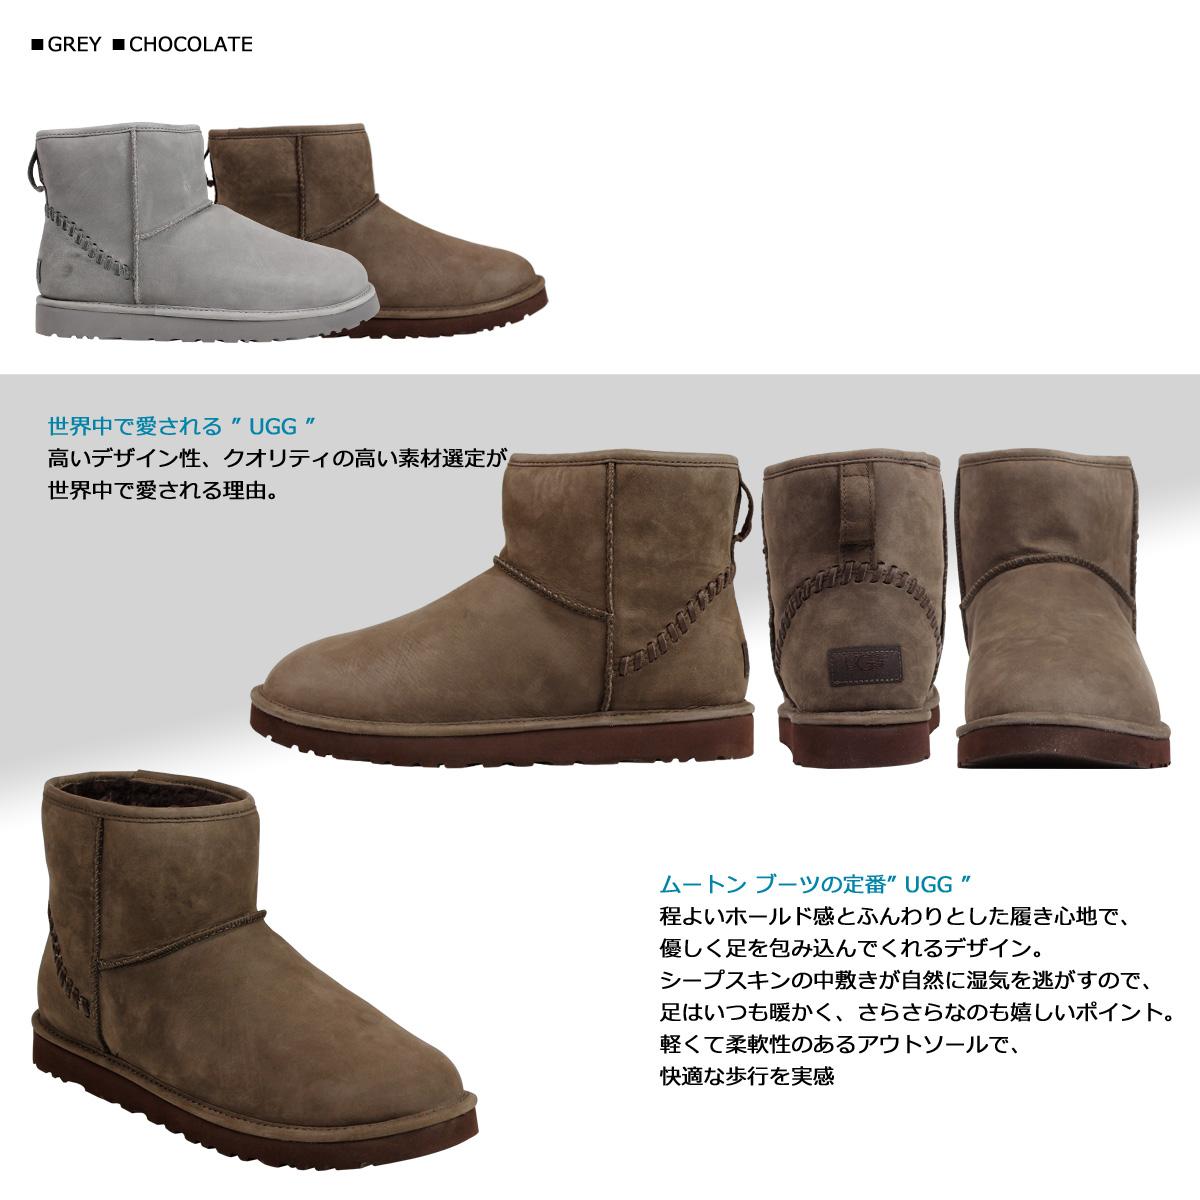 3f2aae9106b UGG UGG men's MENS CLASSIC MINI DECO CAPRA Sheepskin Boots Classic mini  Deco Capra 1009687 2 color [9/30 new in stock]